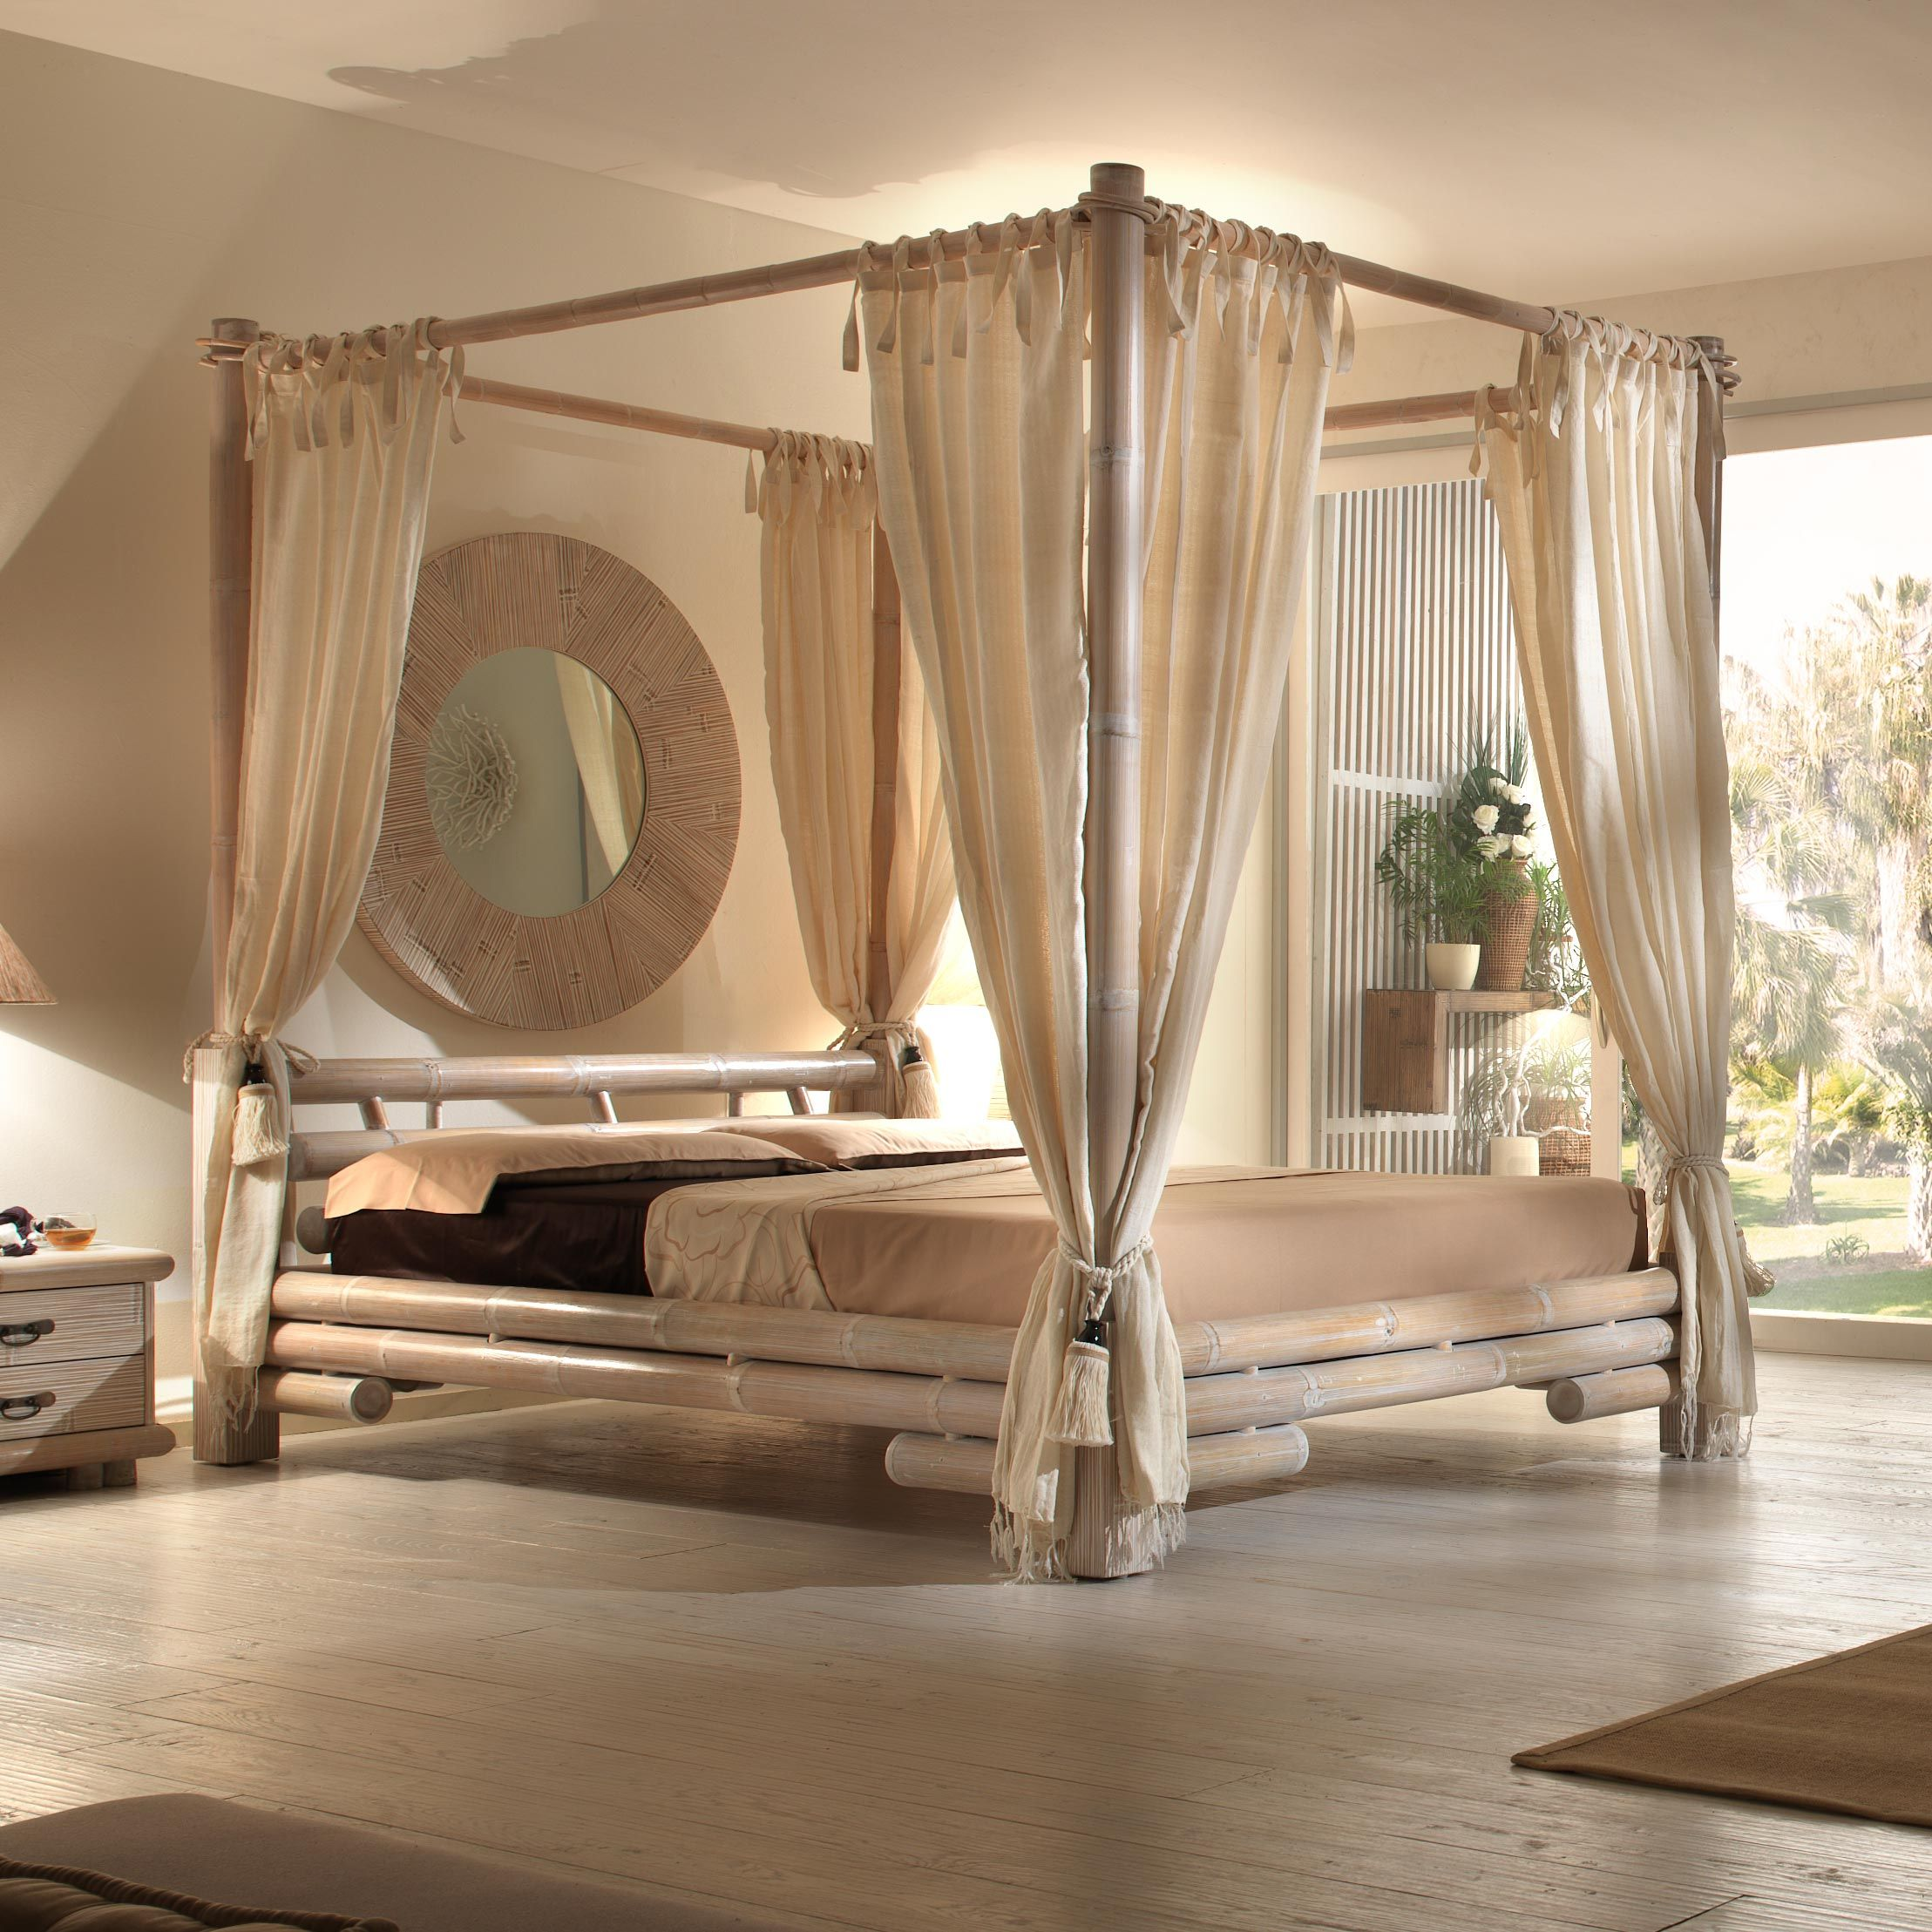 beau lit a baldaquin  Interior design bedroom teenage, Bed